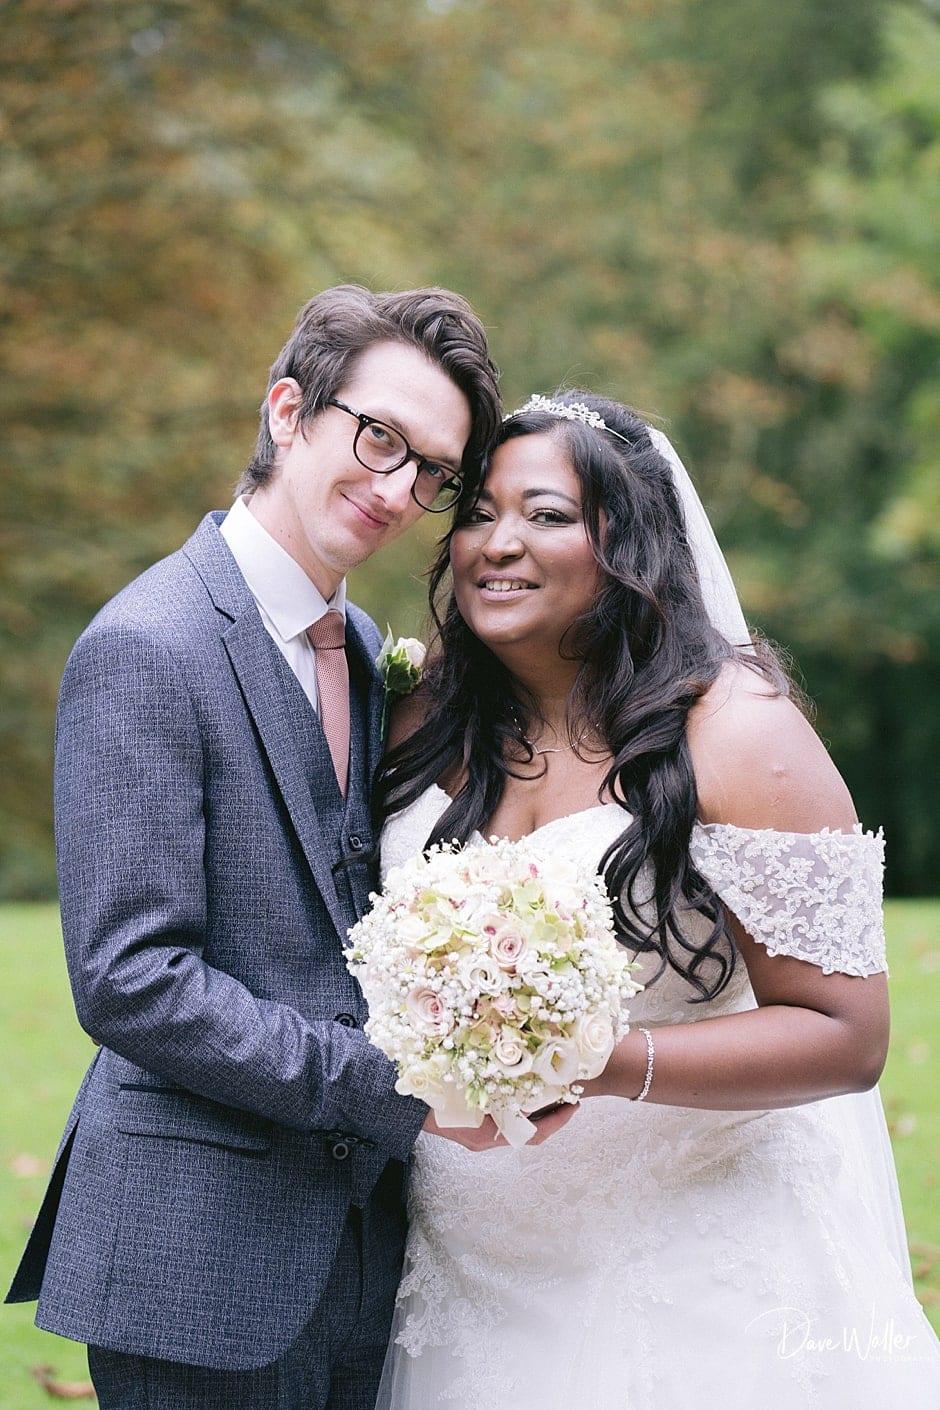 Blackbrook House, Belper Wedding Photographer | Derbyshire Wedding Photography | Ash & James